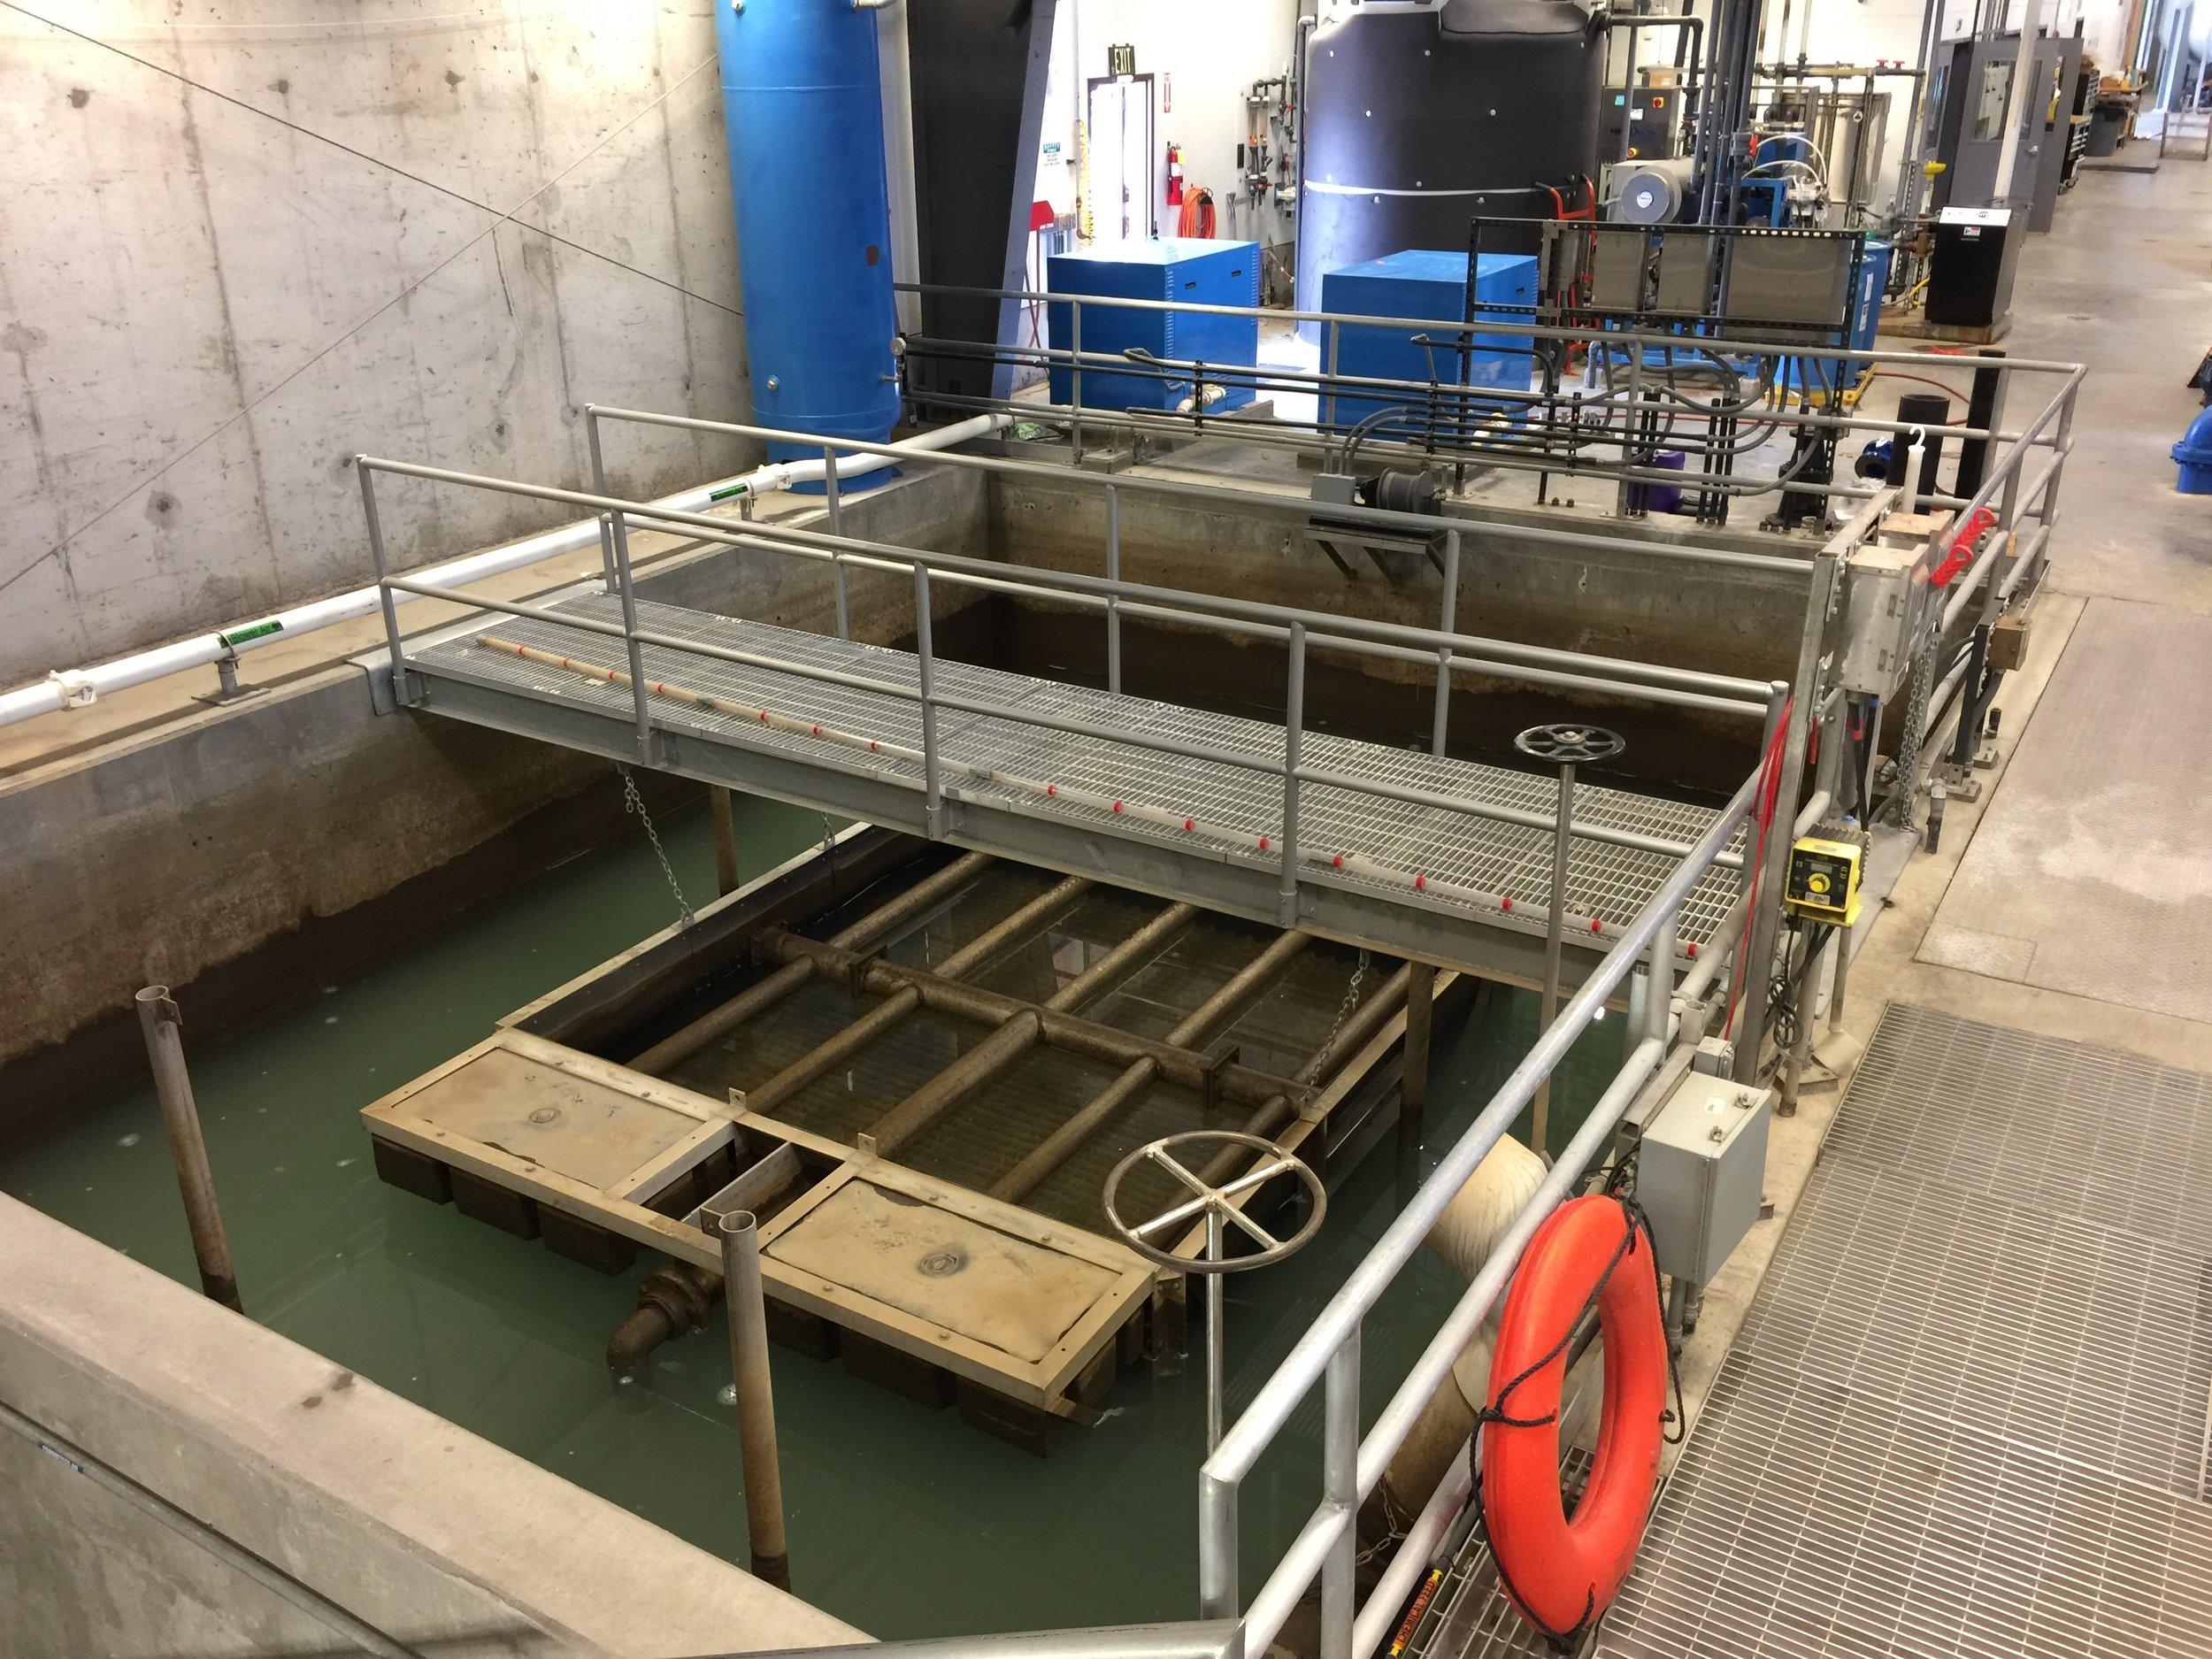 12. Membrane Backwash Tank showing new floating tube settlers for improved clarification.